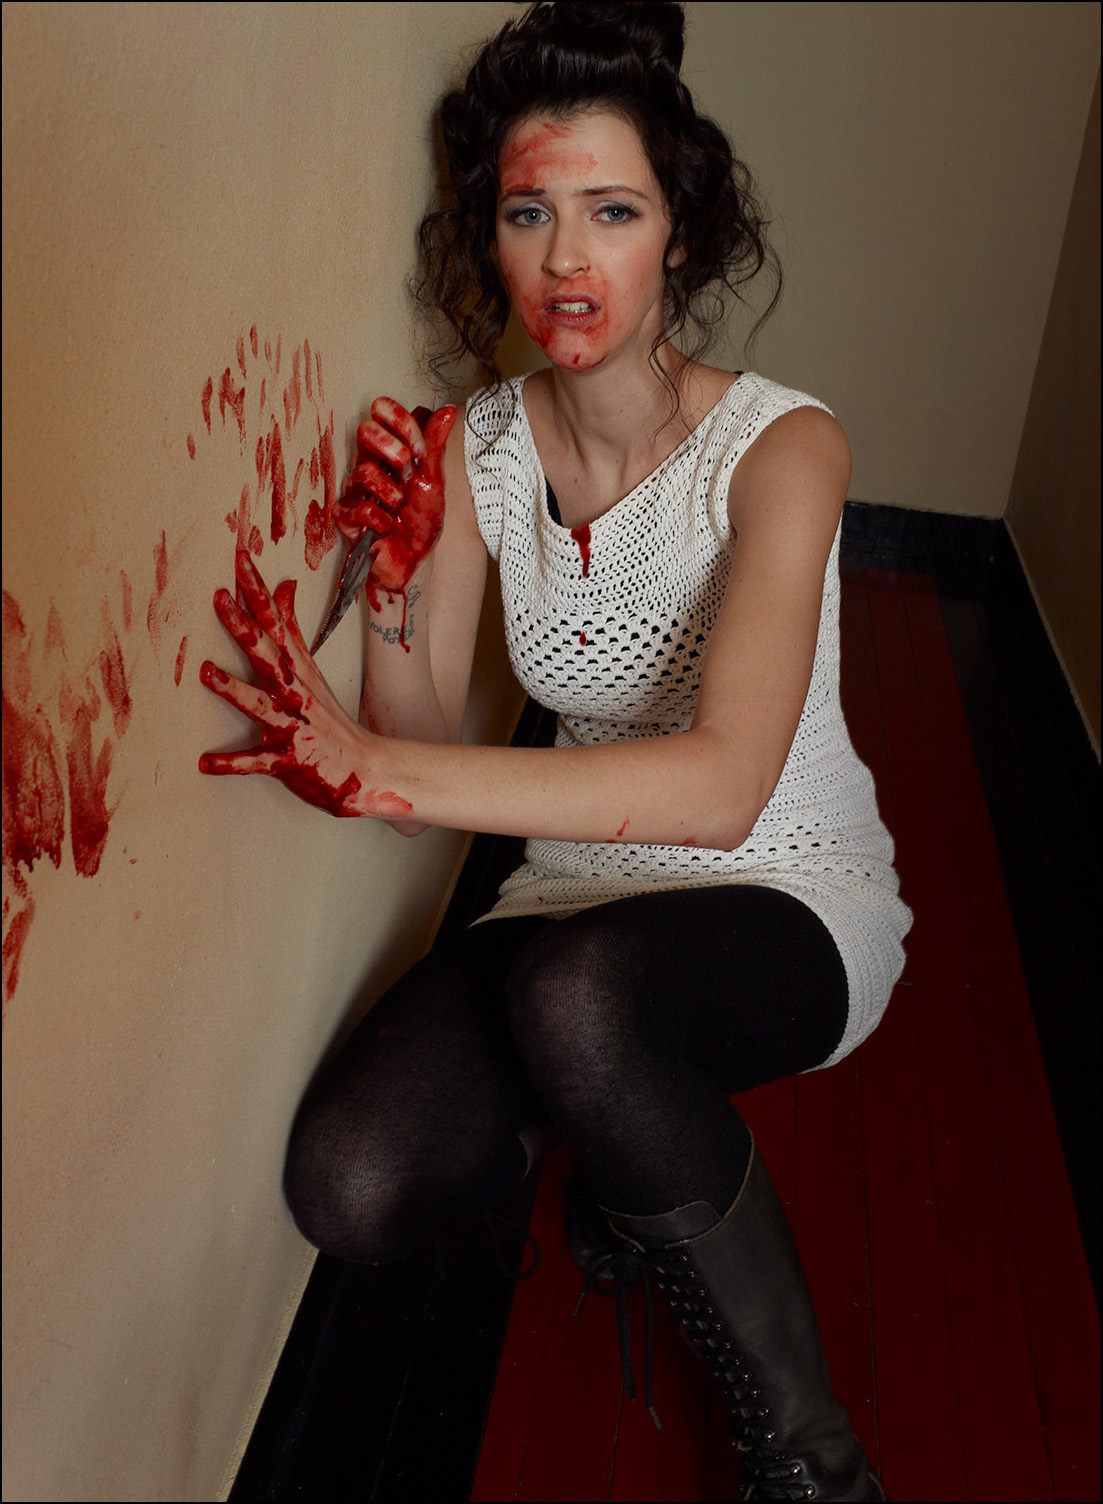 Shannon's Bloodbath, 2010